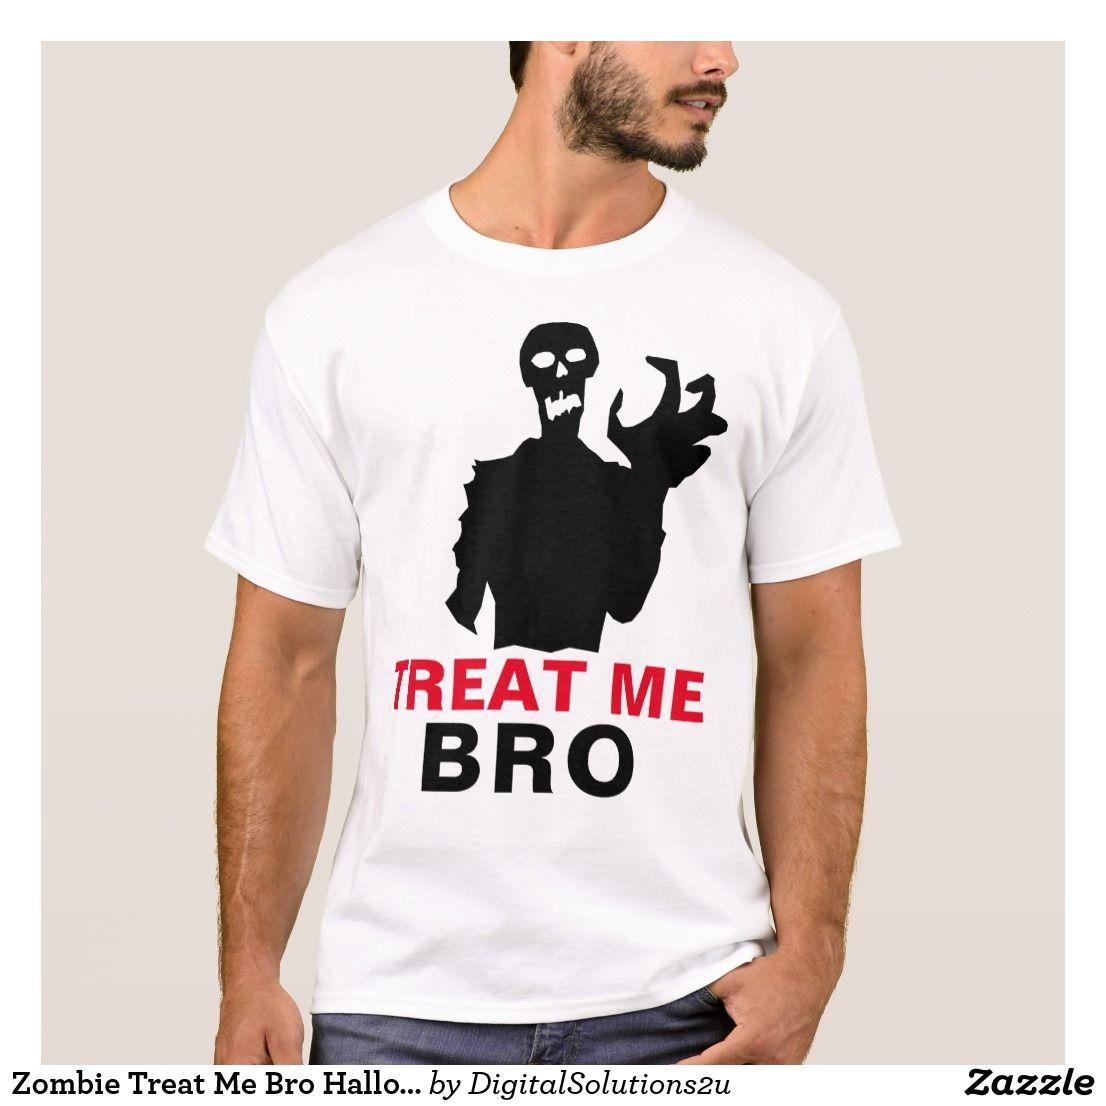 Design your own t shirt zazzle - Zombie Treat Me Bro Halloween Funny Customizable T Shirt